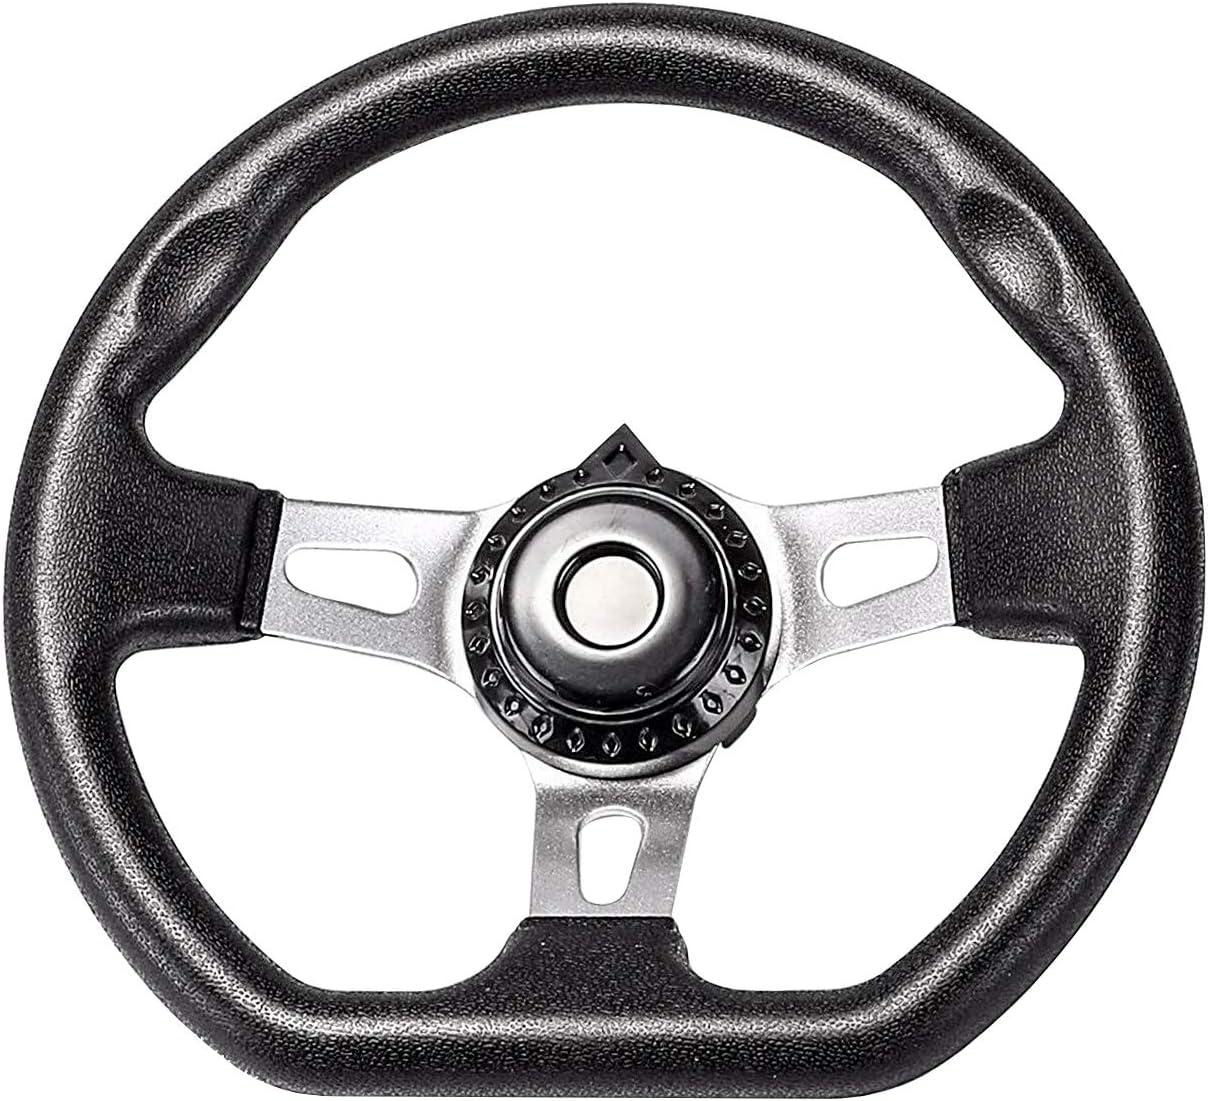 ZXTDR 10.6'' Steering Wheel For Direct sale of online shop manufacturer Buggy Mini Kart Kandi Go